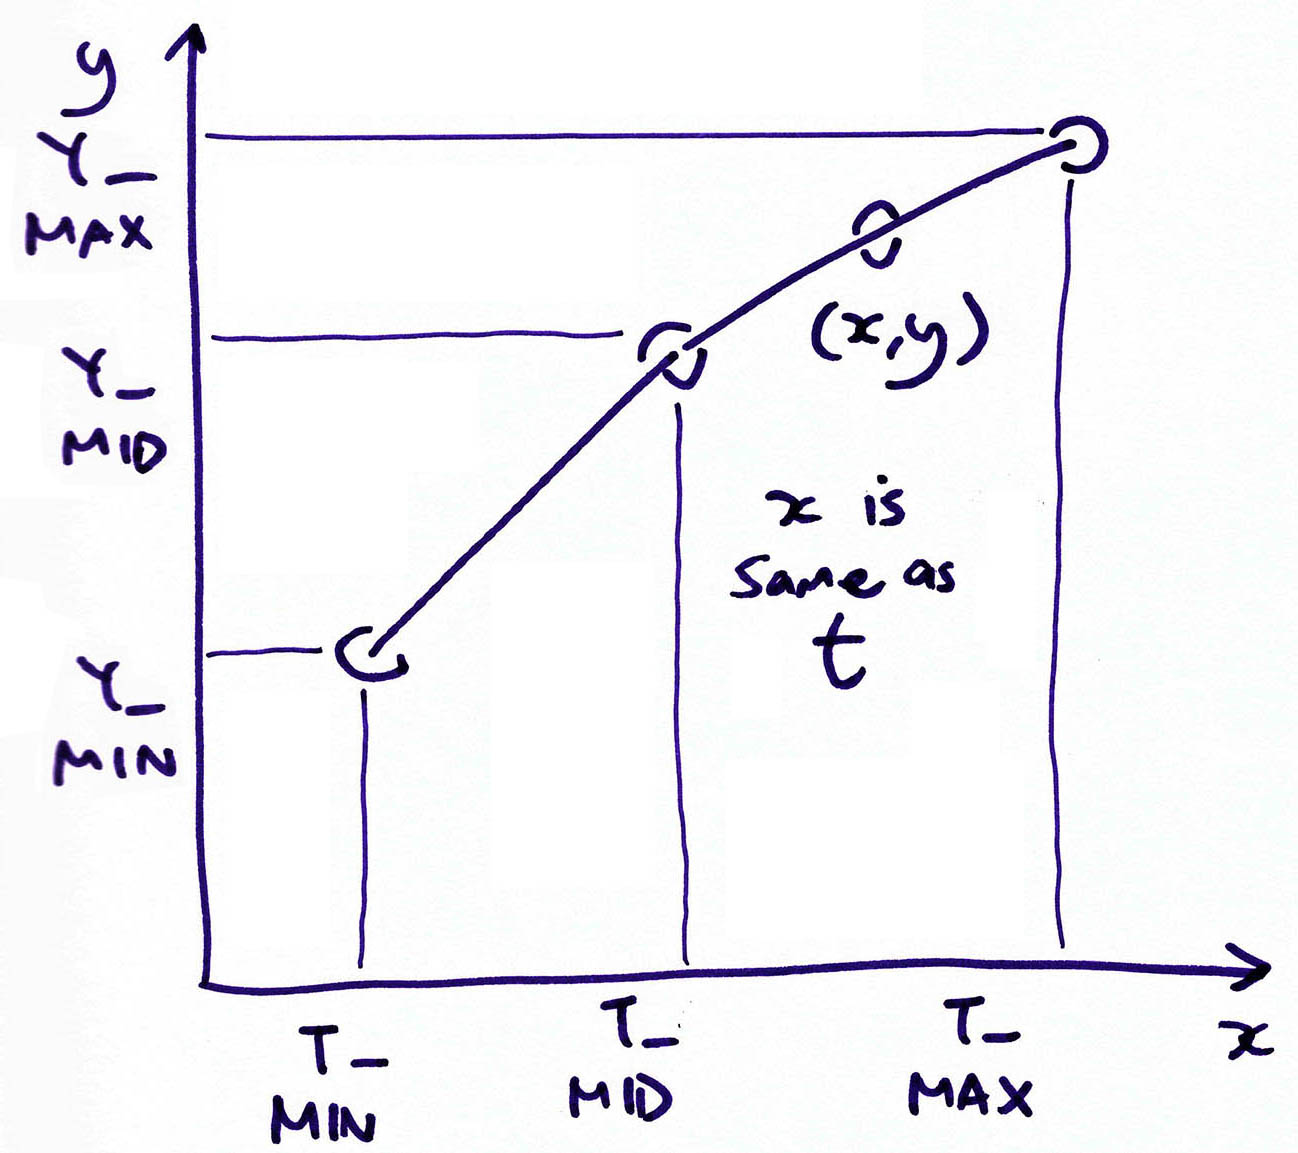 Computing the Linear Interpolation